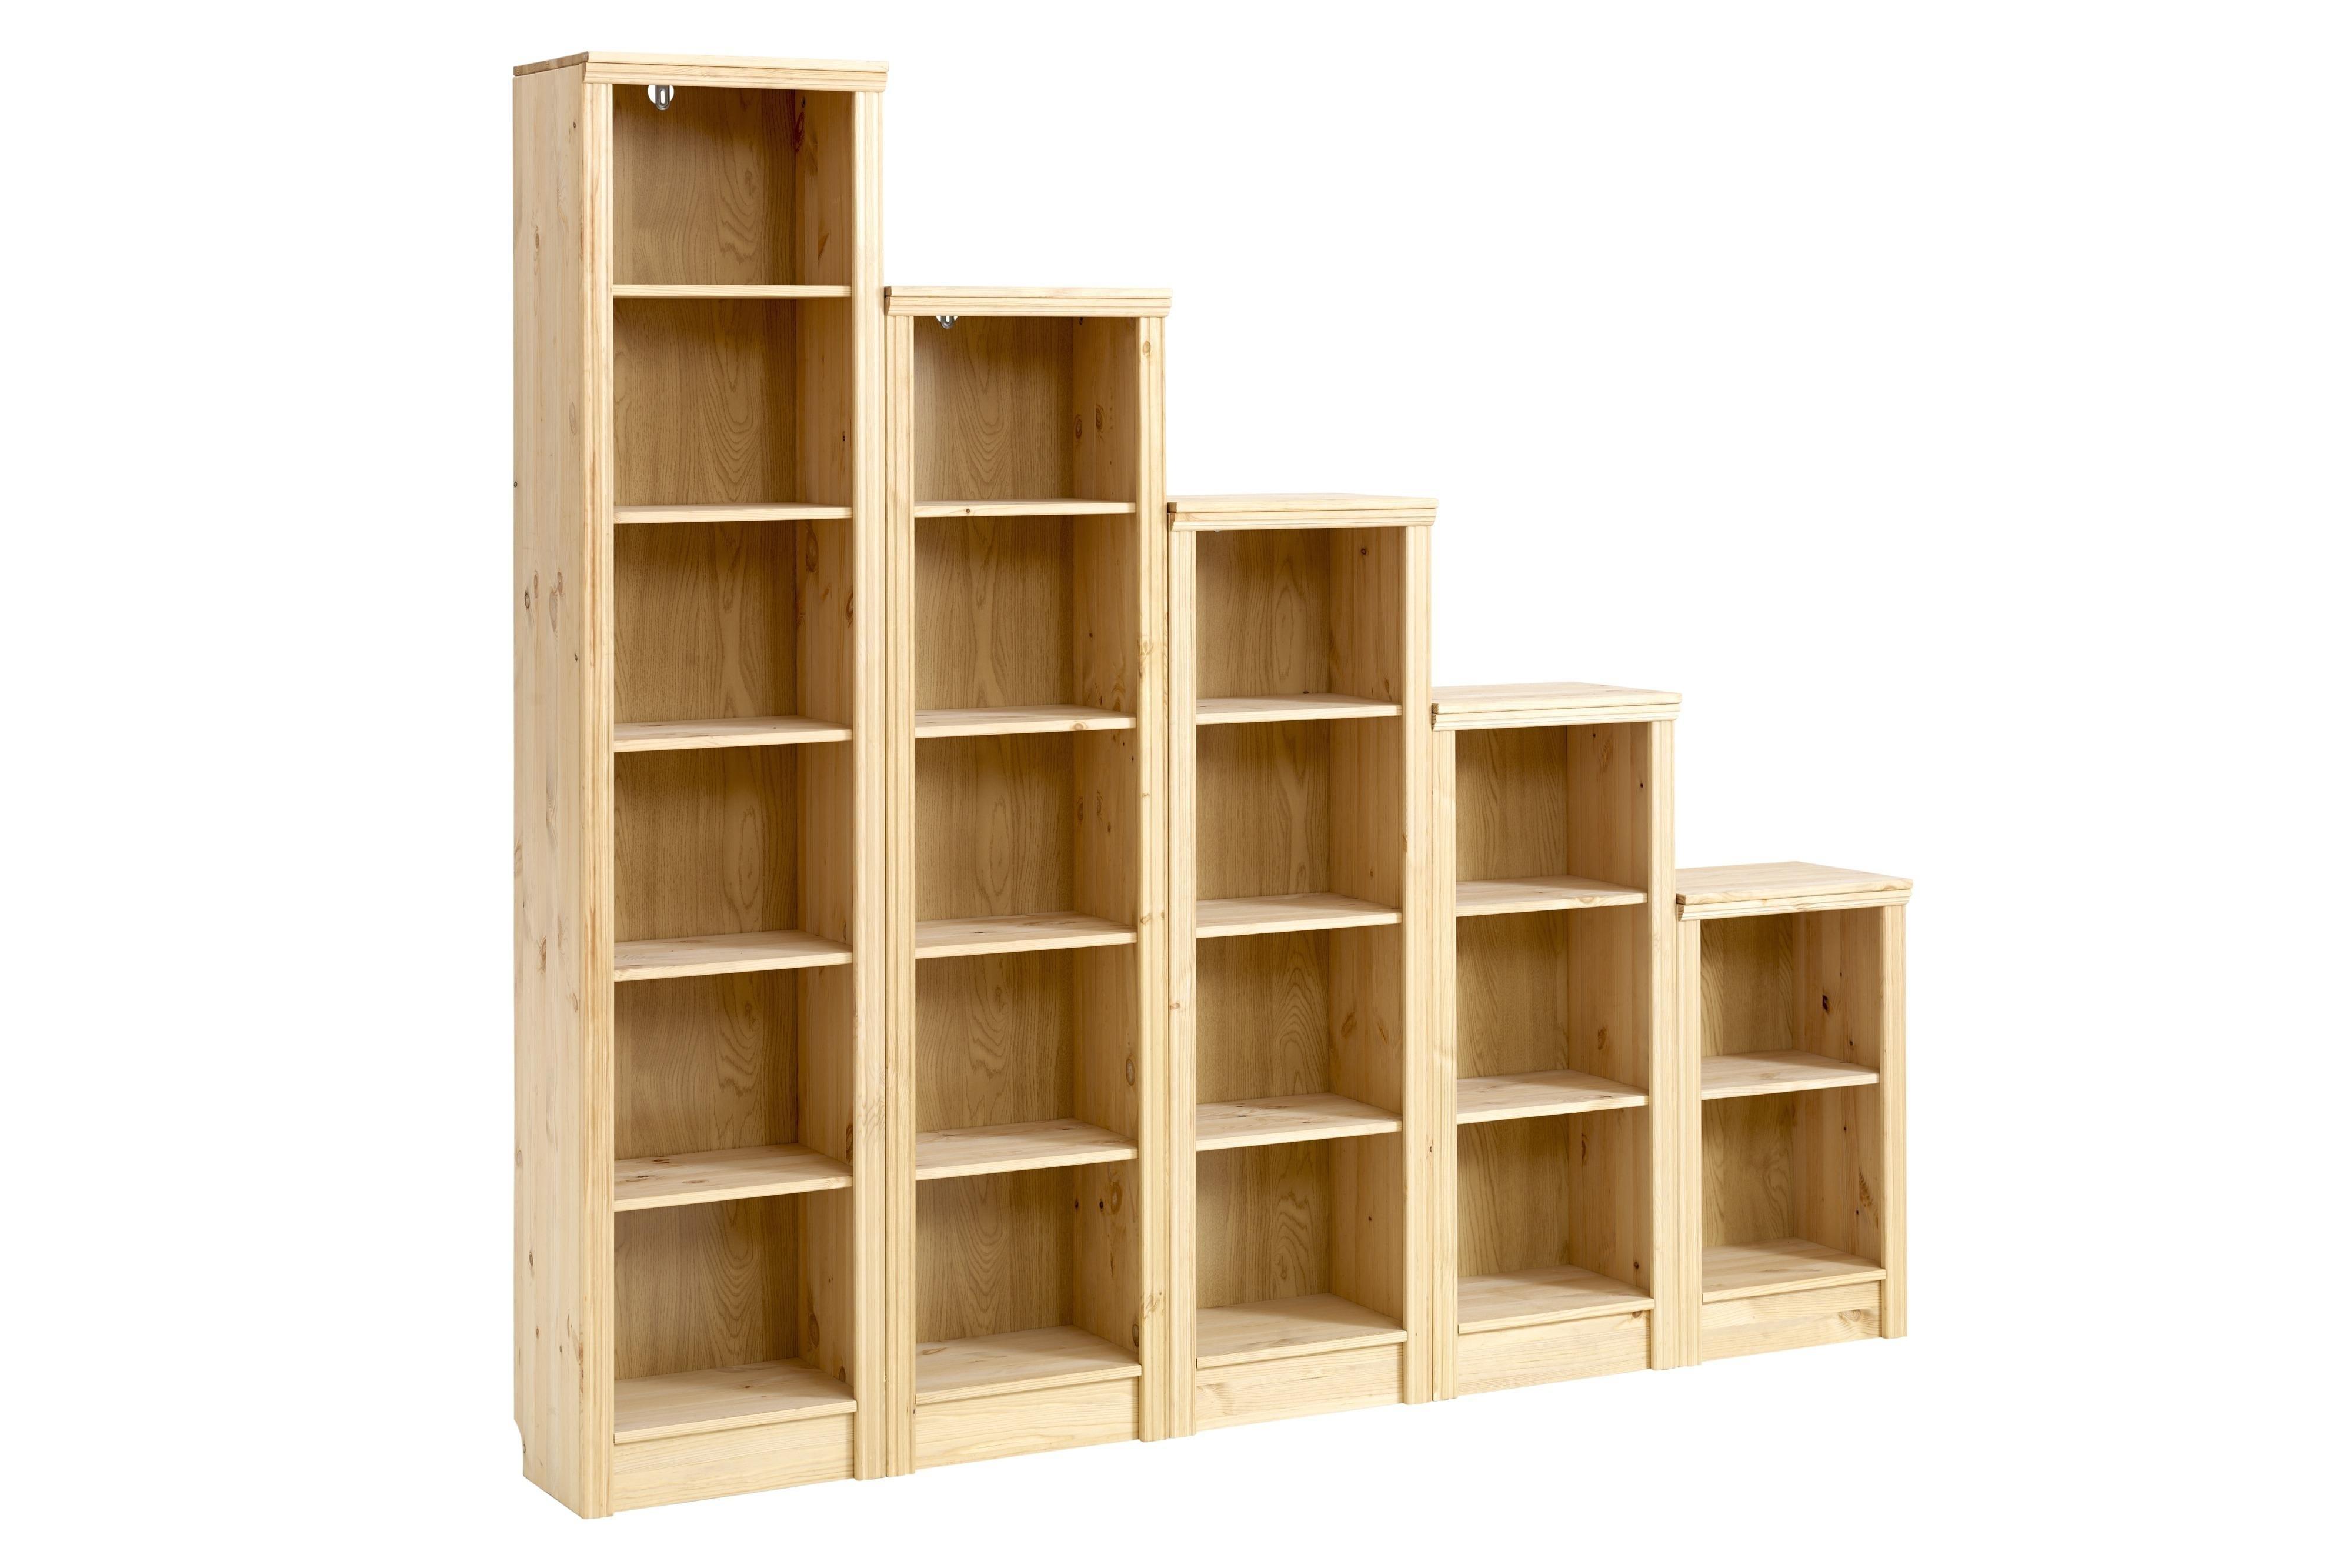 opbergrek kopen praktische opbergrekken shop je hier otto. Black Bedroom Furniture Sets. Home Design Ideas